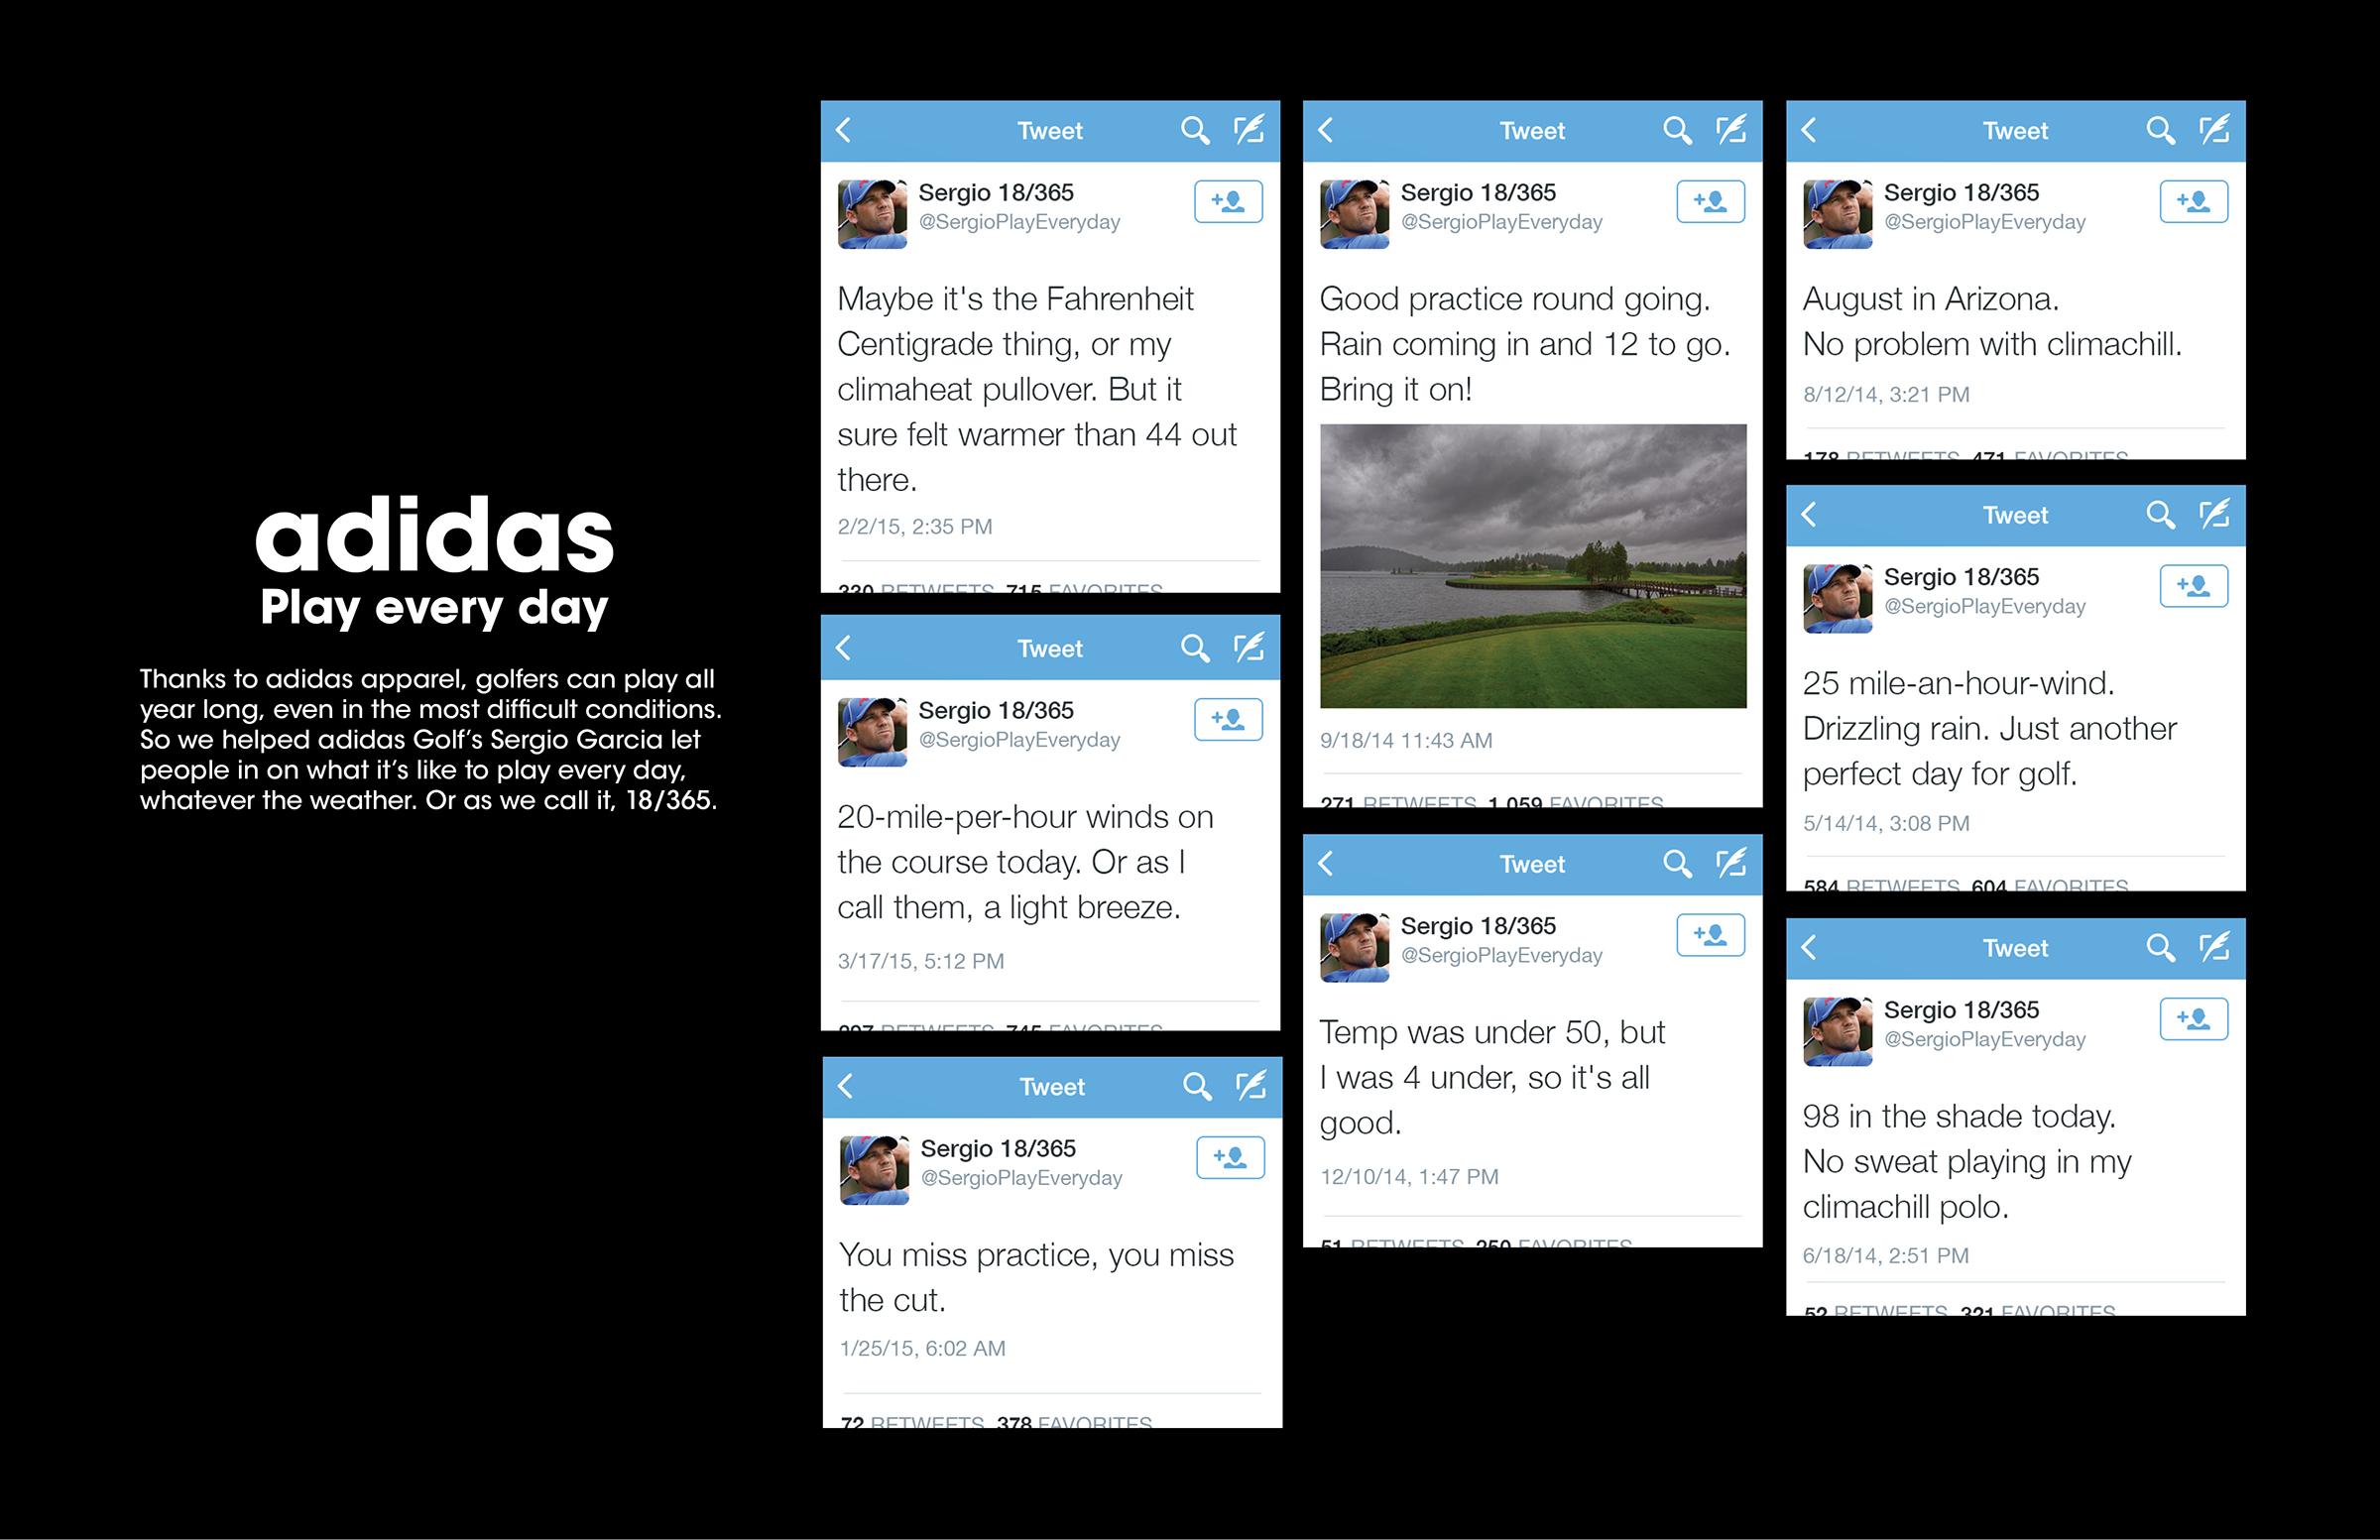 adidas_Every_day.jpg